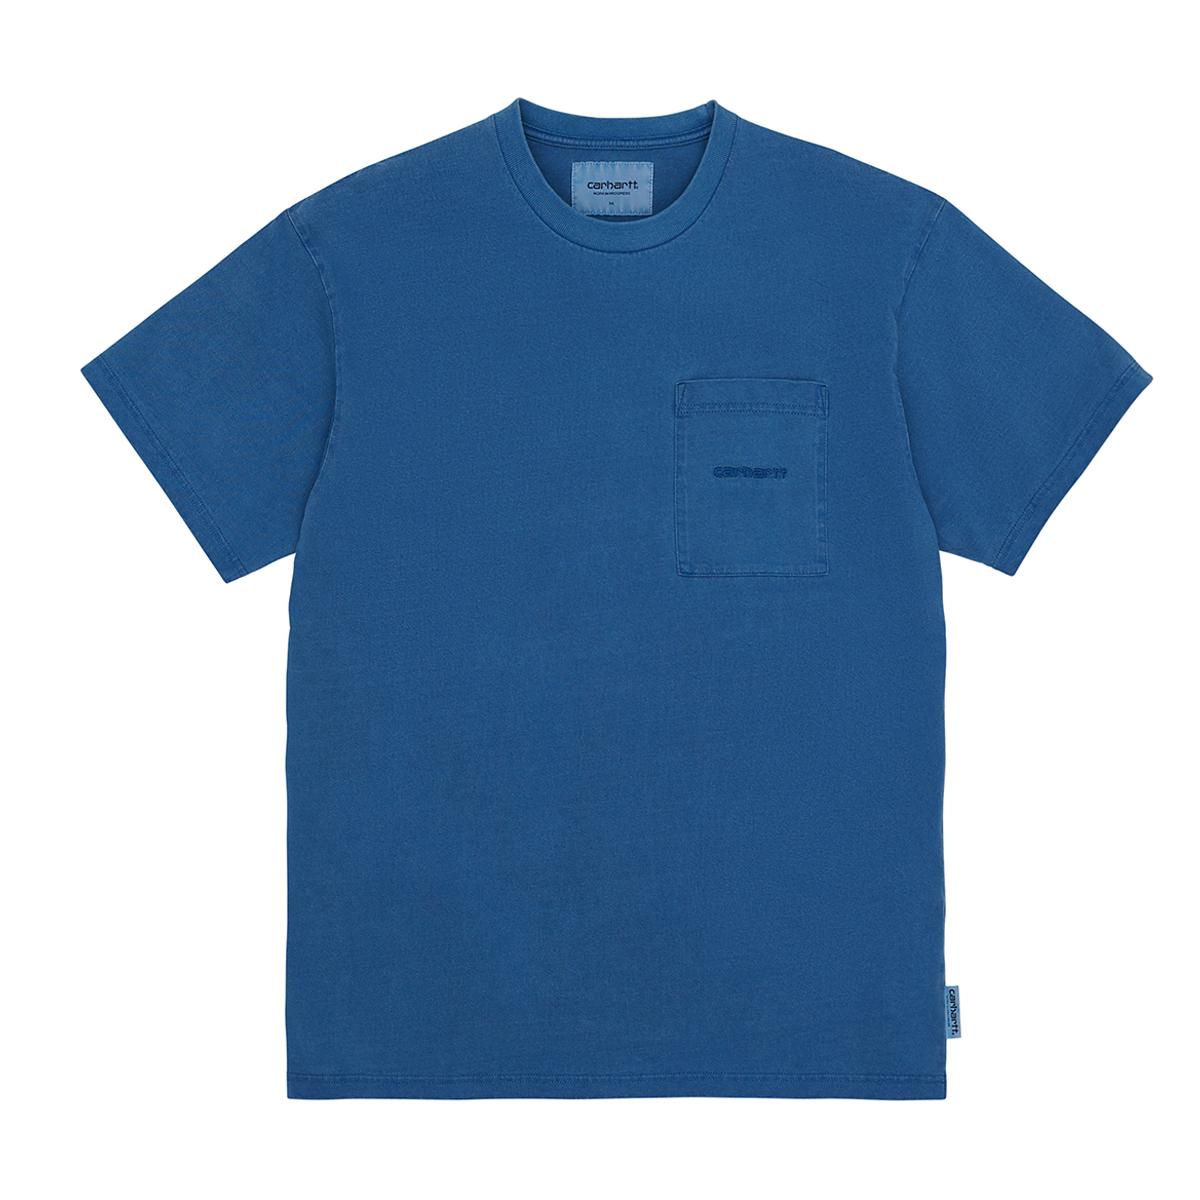 S/S Pluto Pocket T-shirt (PD)